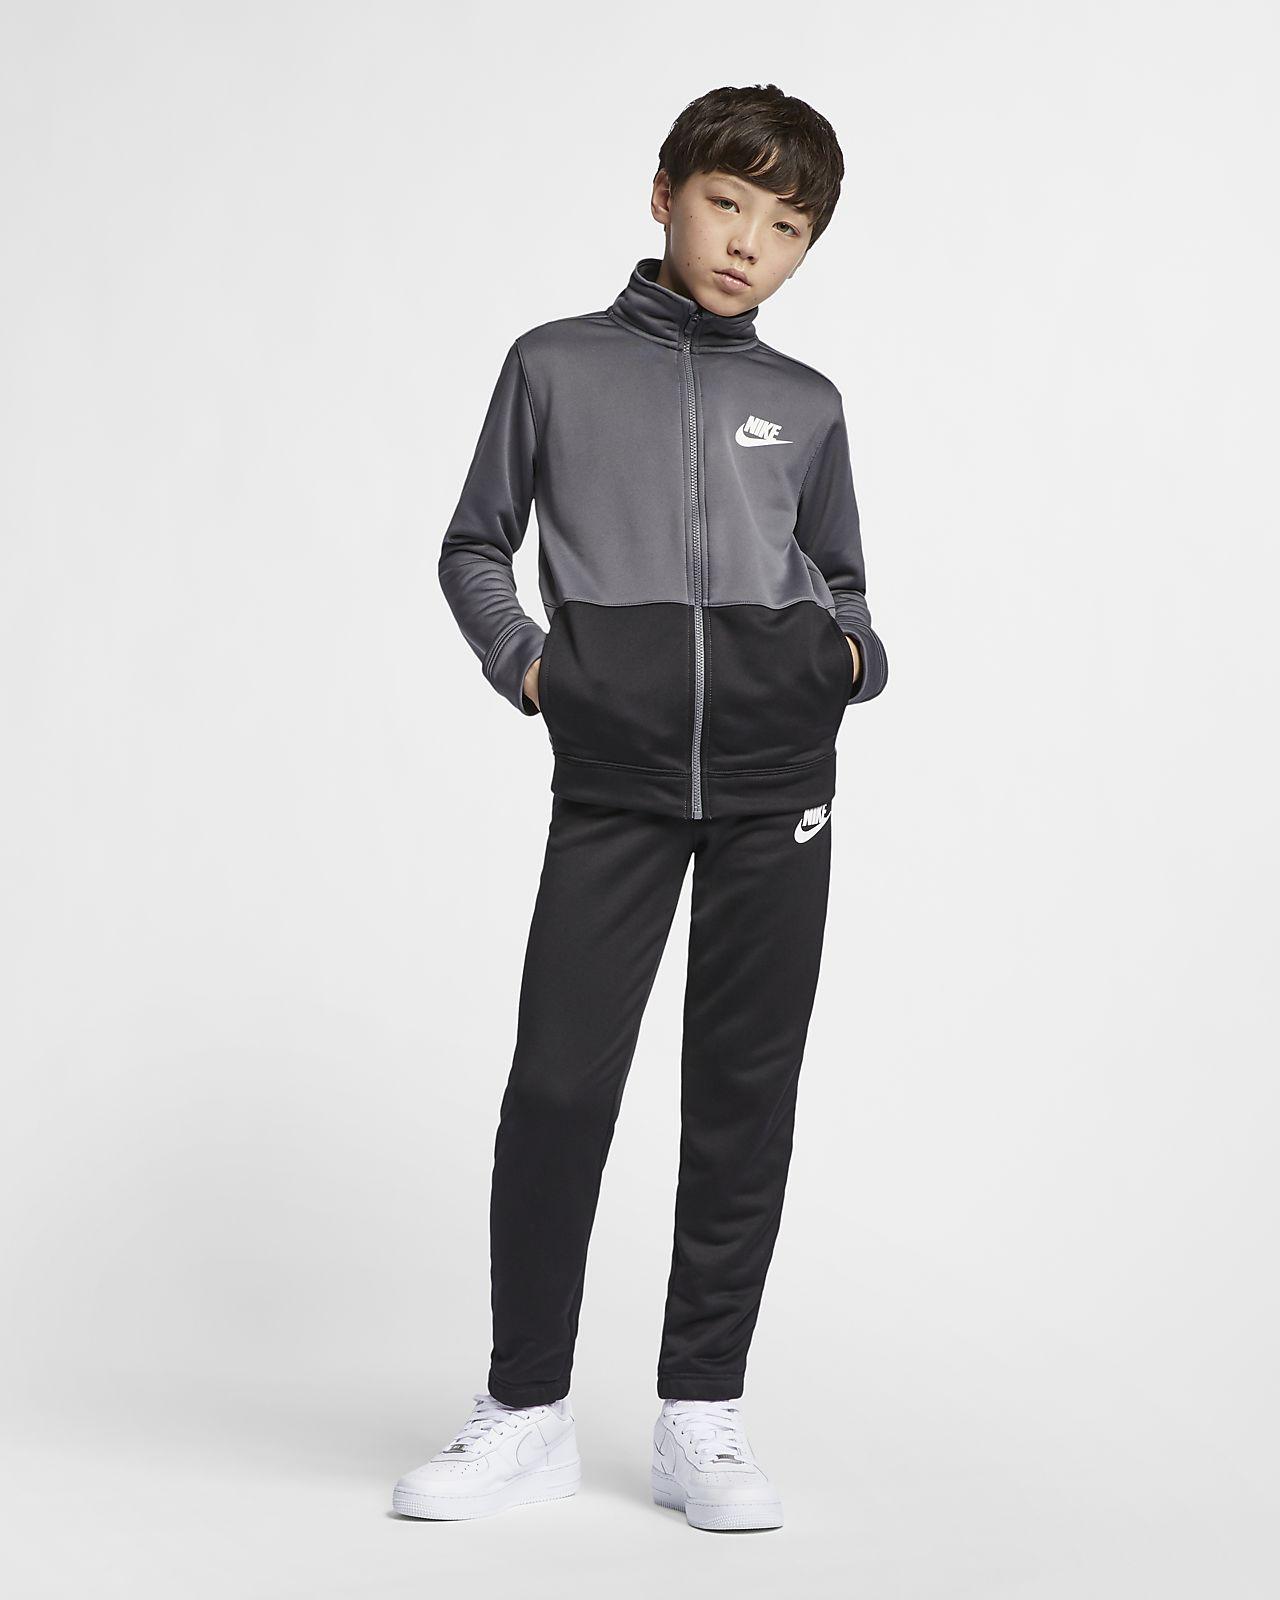 Survêtement Nike Sportswear pour Garçon plus âgé